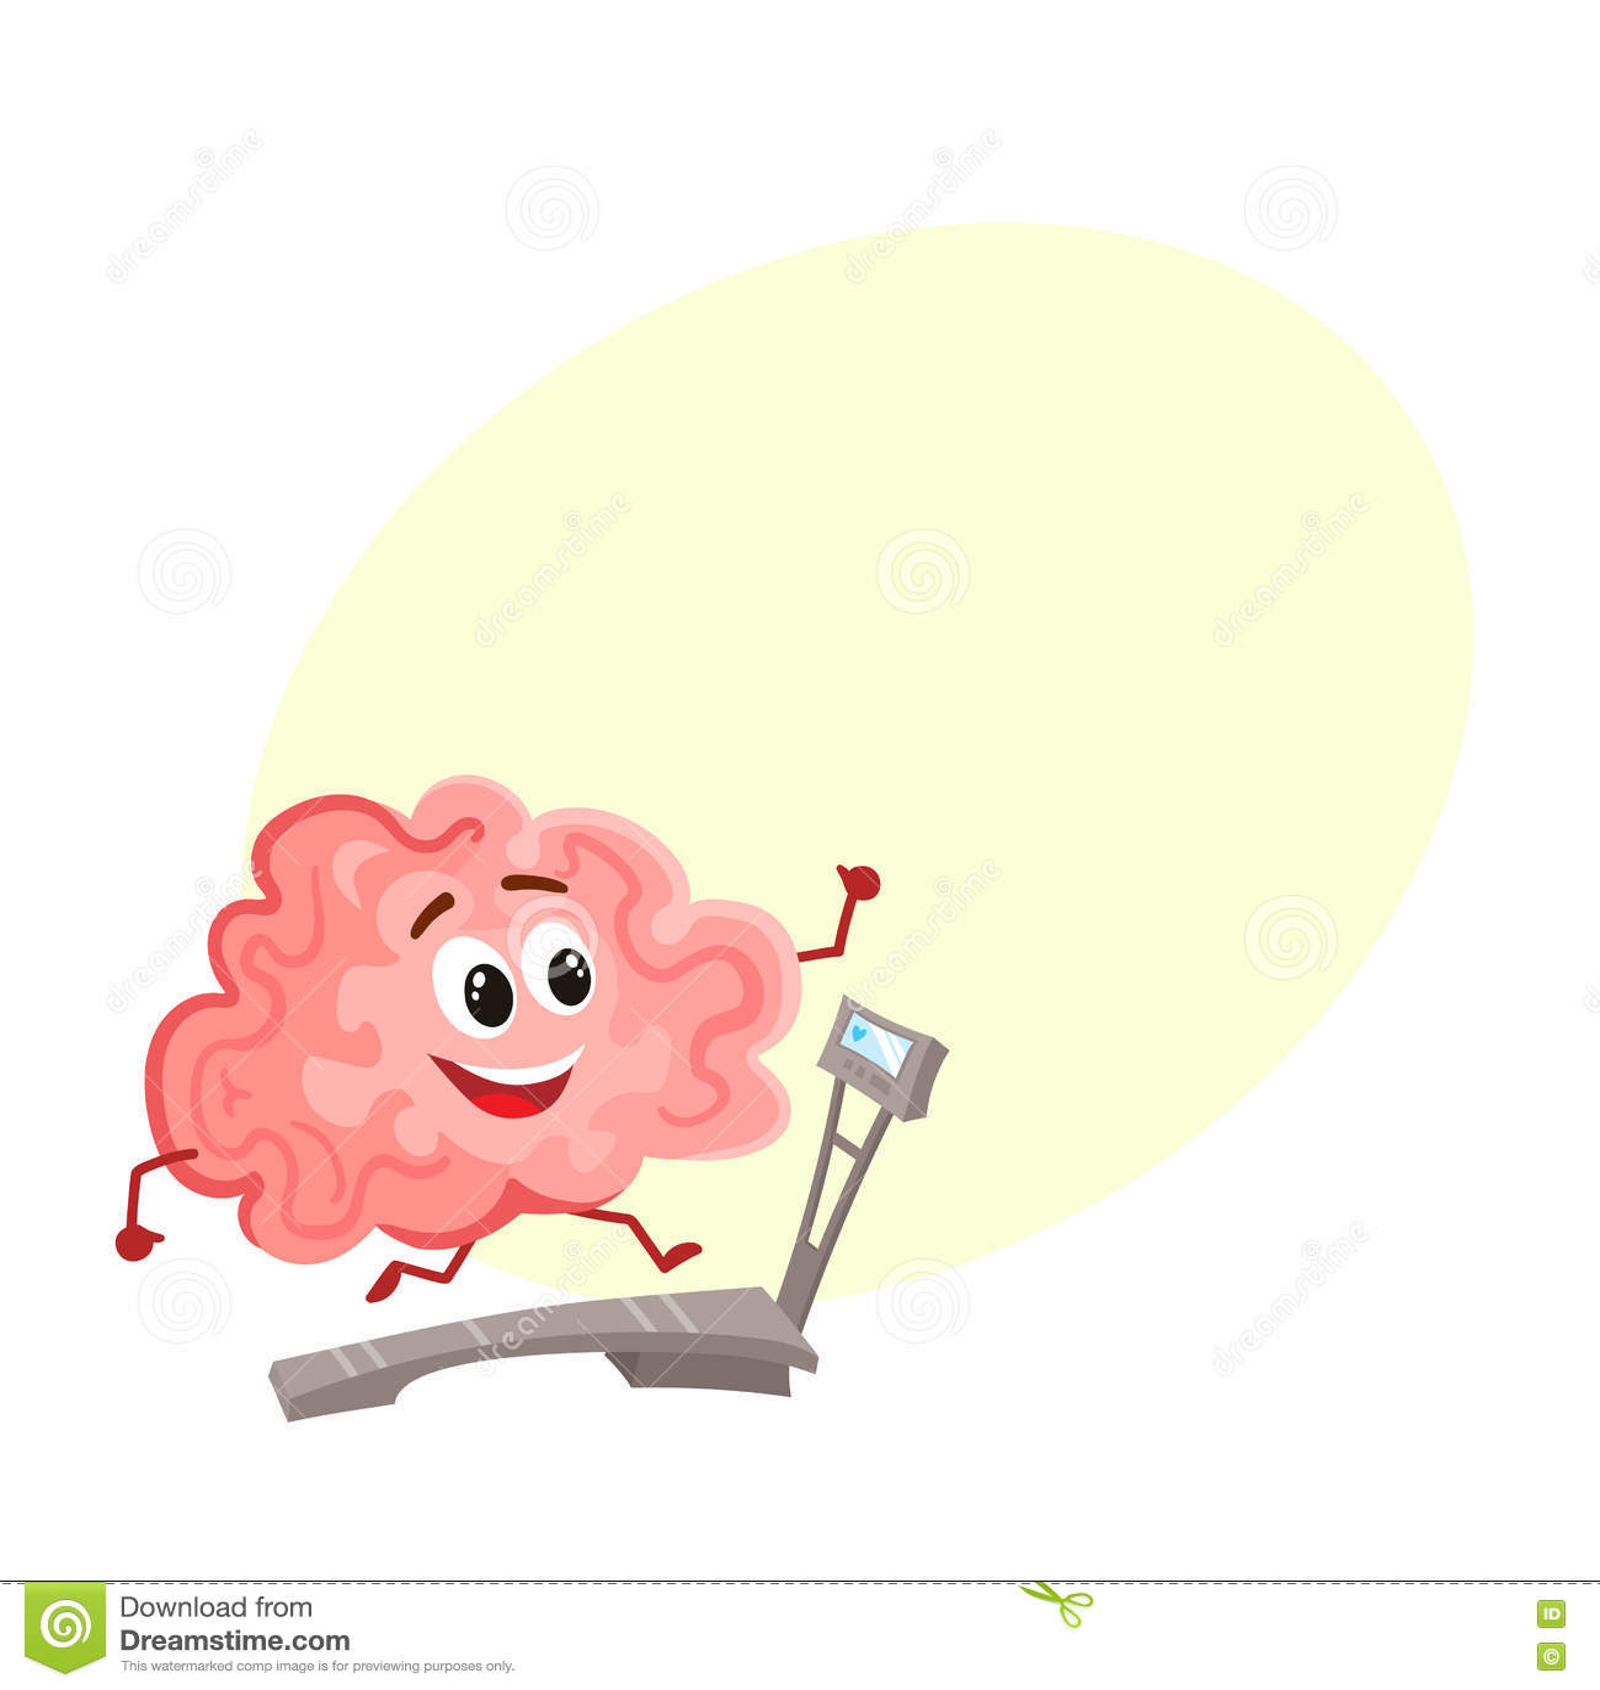 Funny smiling brain running on a treadmill